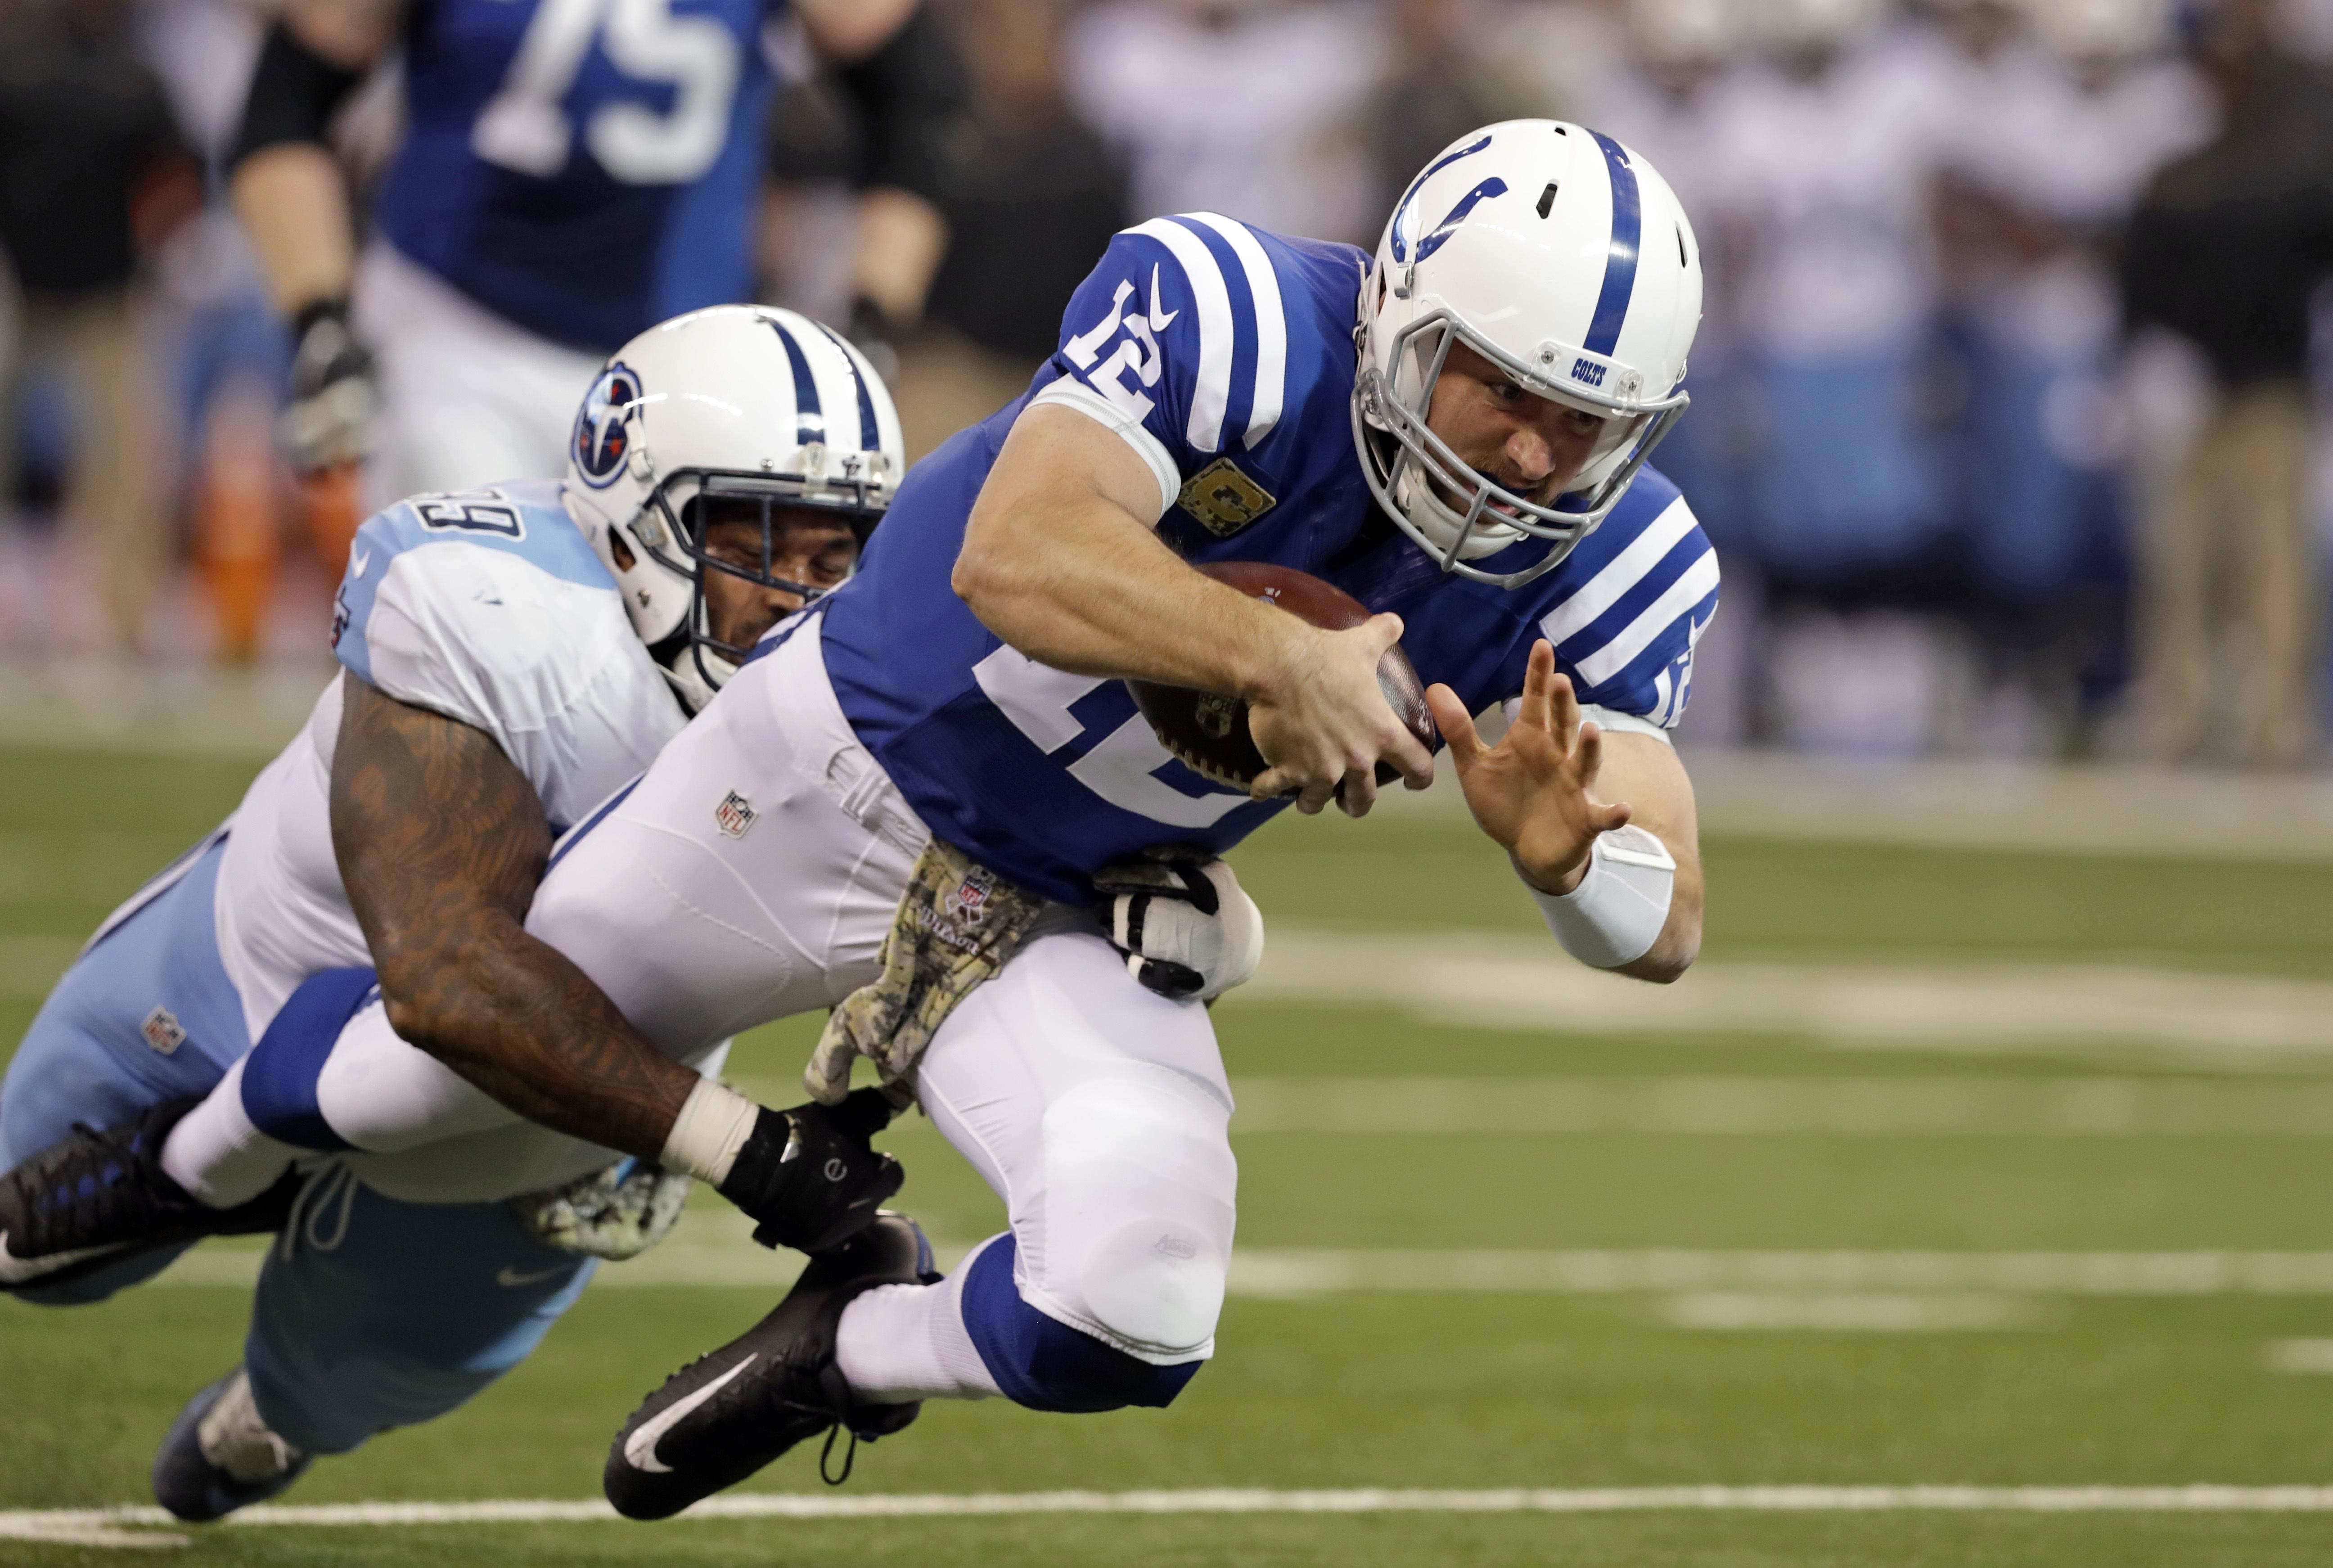 fca2a576 Colts QB Andrew Luck in concussion protocol | The Spokesman-Review